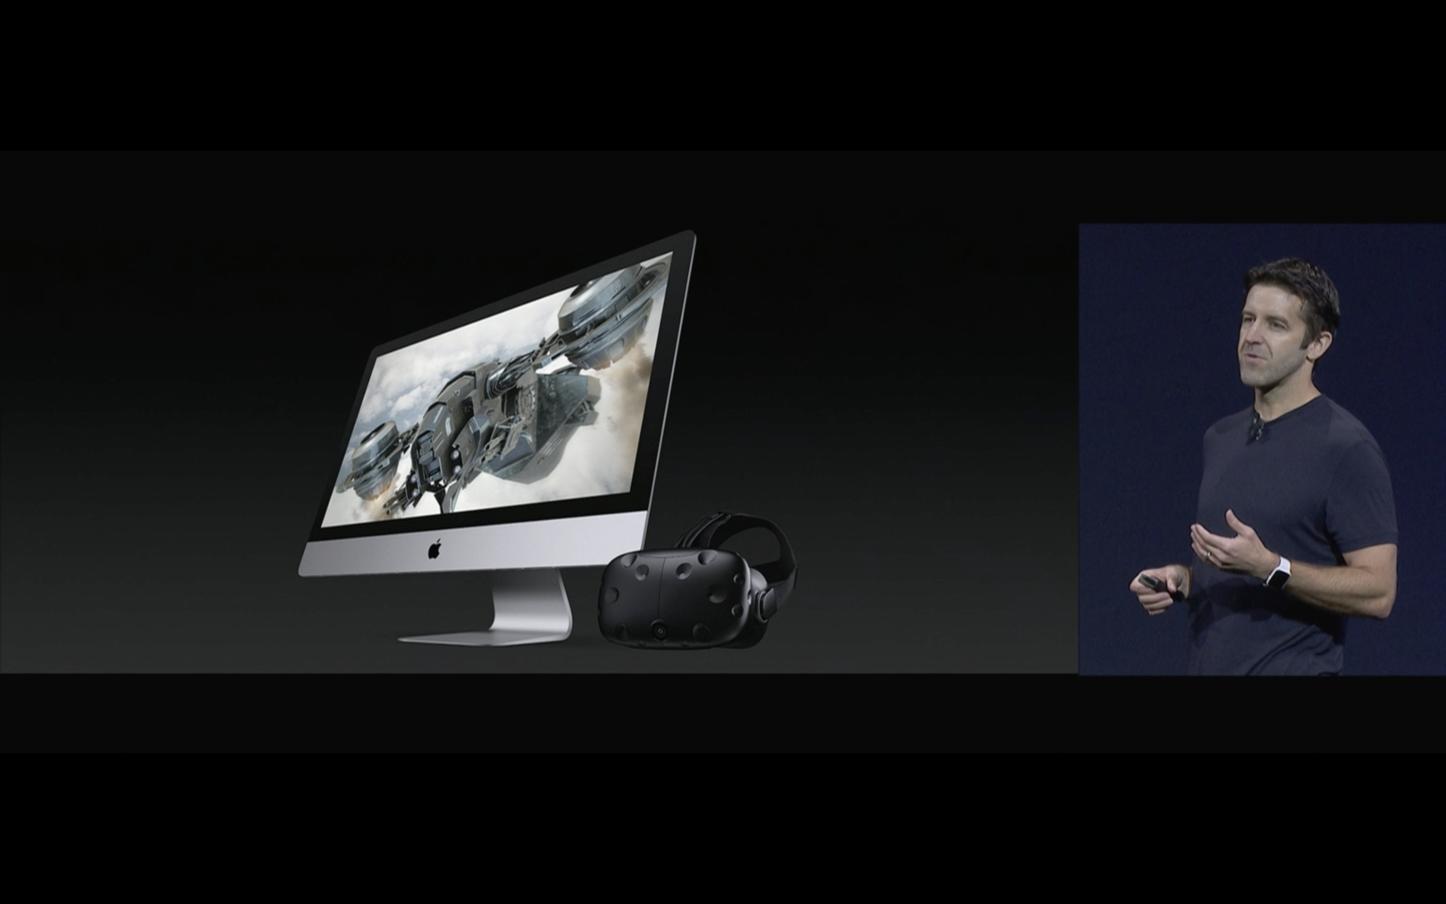 New-iMac-2017-WWDC17-17.png